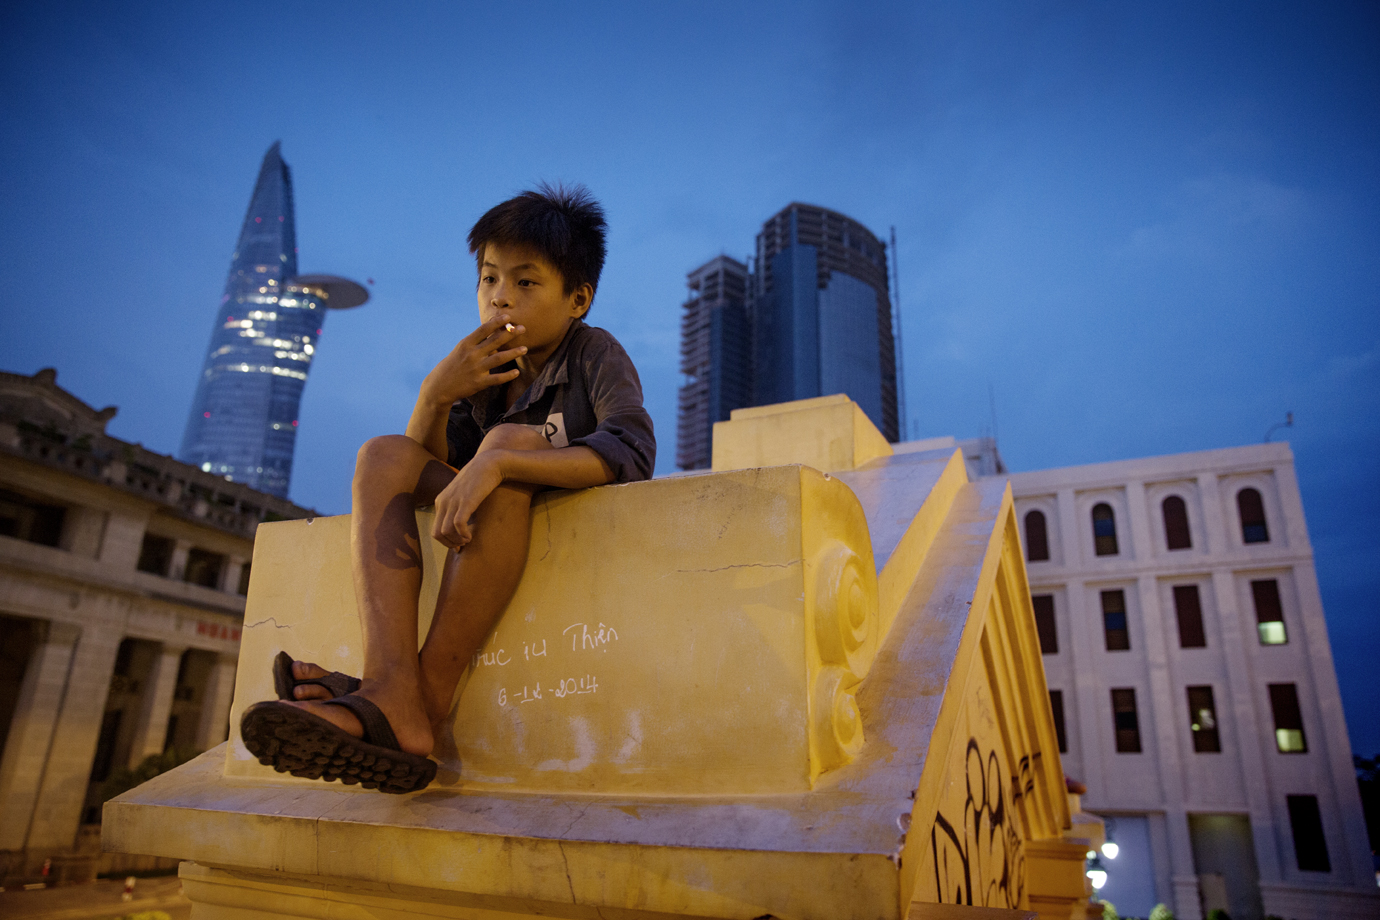 Street child smoking a cigarette, Saigon / Vietnam - 2015